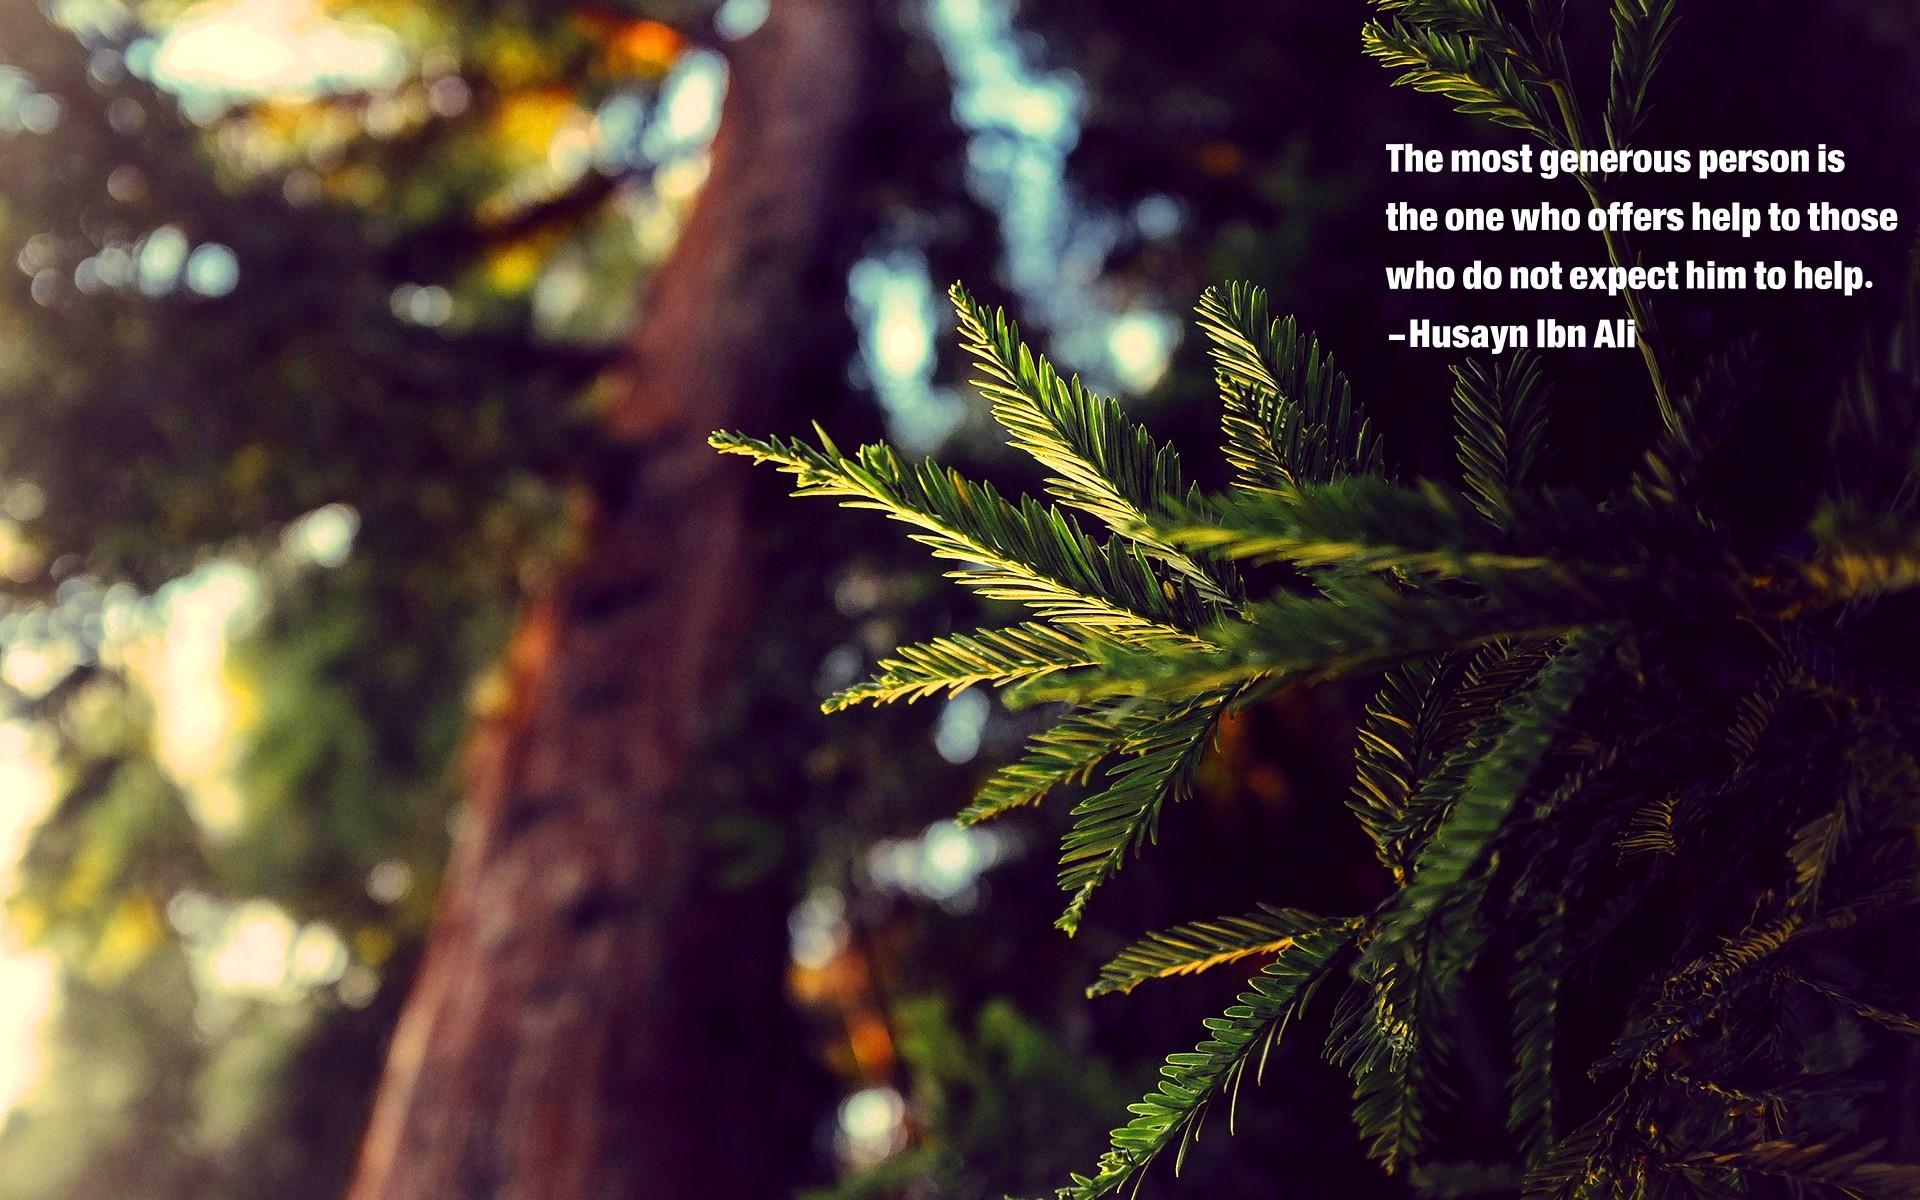 Wallpaper : Sunlight, Forest, Quote, Nature, Branch, Jungle, Rainforest,  Islam, Imam Hussain, Husayn Ibn Ali, Tree, Autumn, Leaf, Flower, Season,  Flora, ...